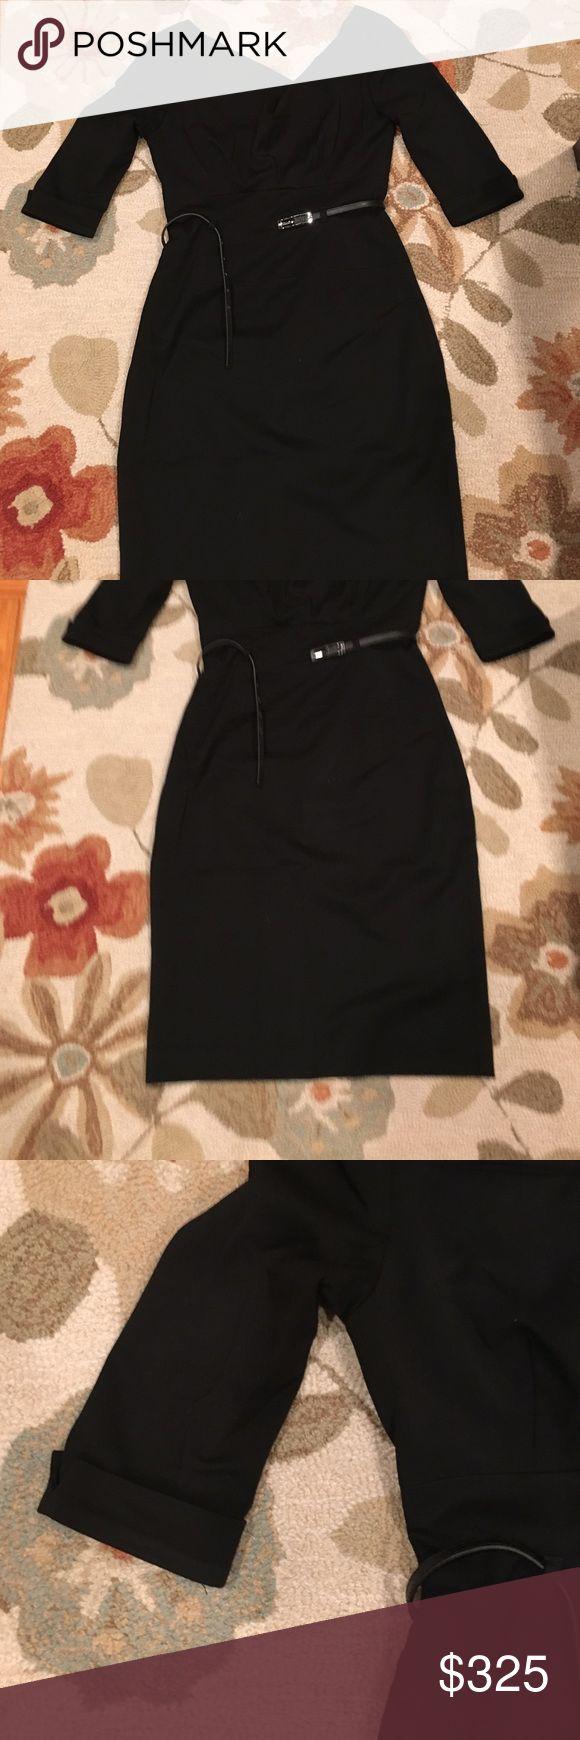 Black Halo Jackie O dress black size 6 Only worn twice, like new Jackie O 3/4 sleeve black dress from Black Halo. Black Halo Dresses Long Sleeve